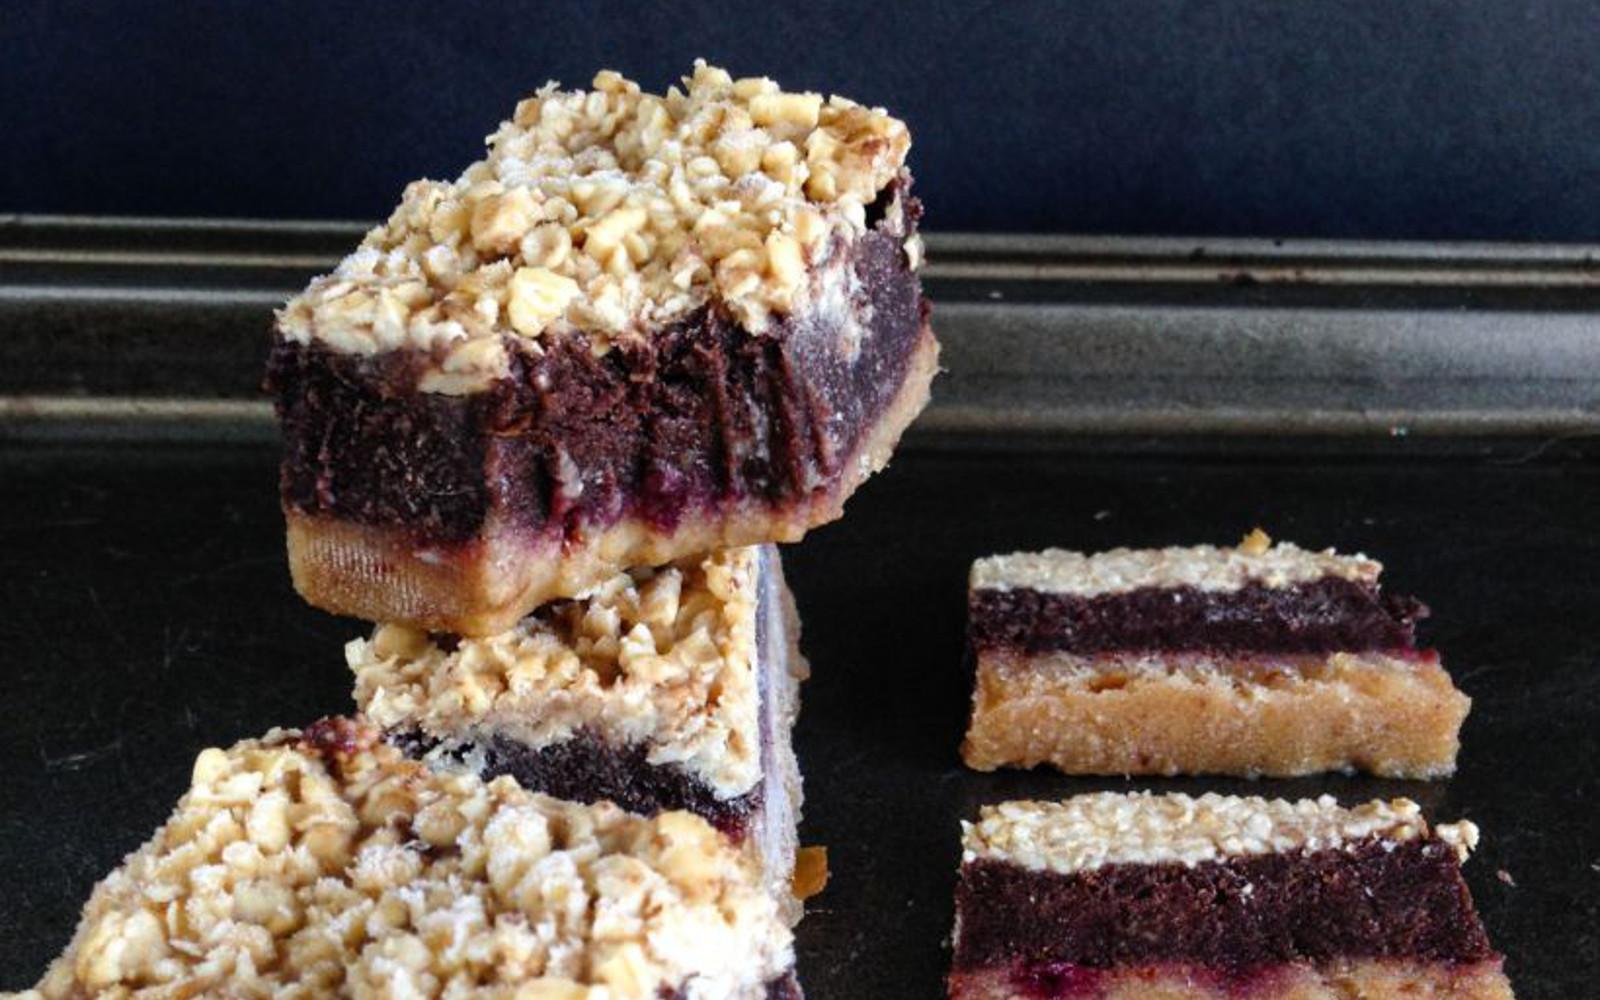 4-Layer Blackberry Jam and Chocolate Crumble Bars